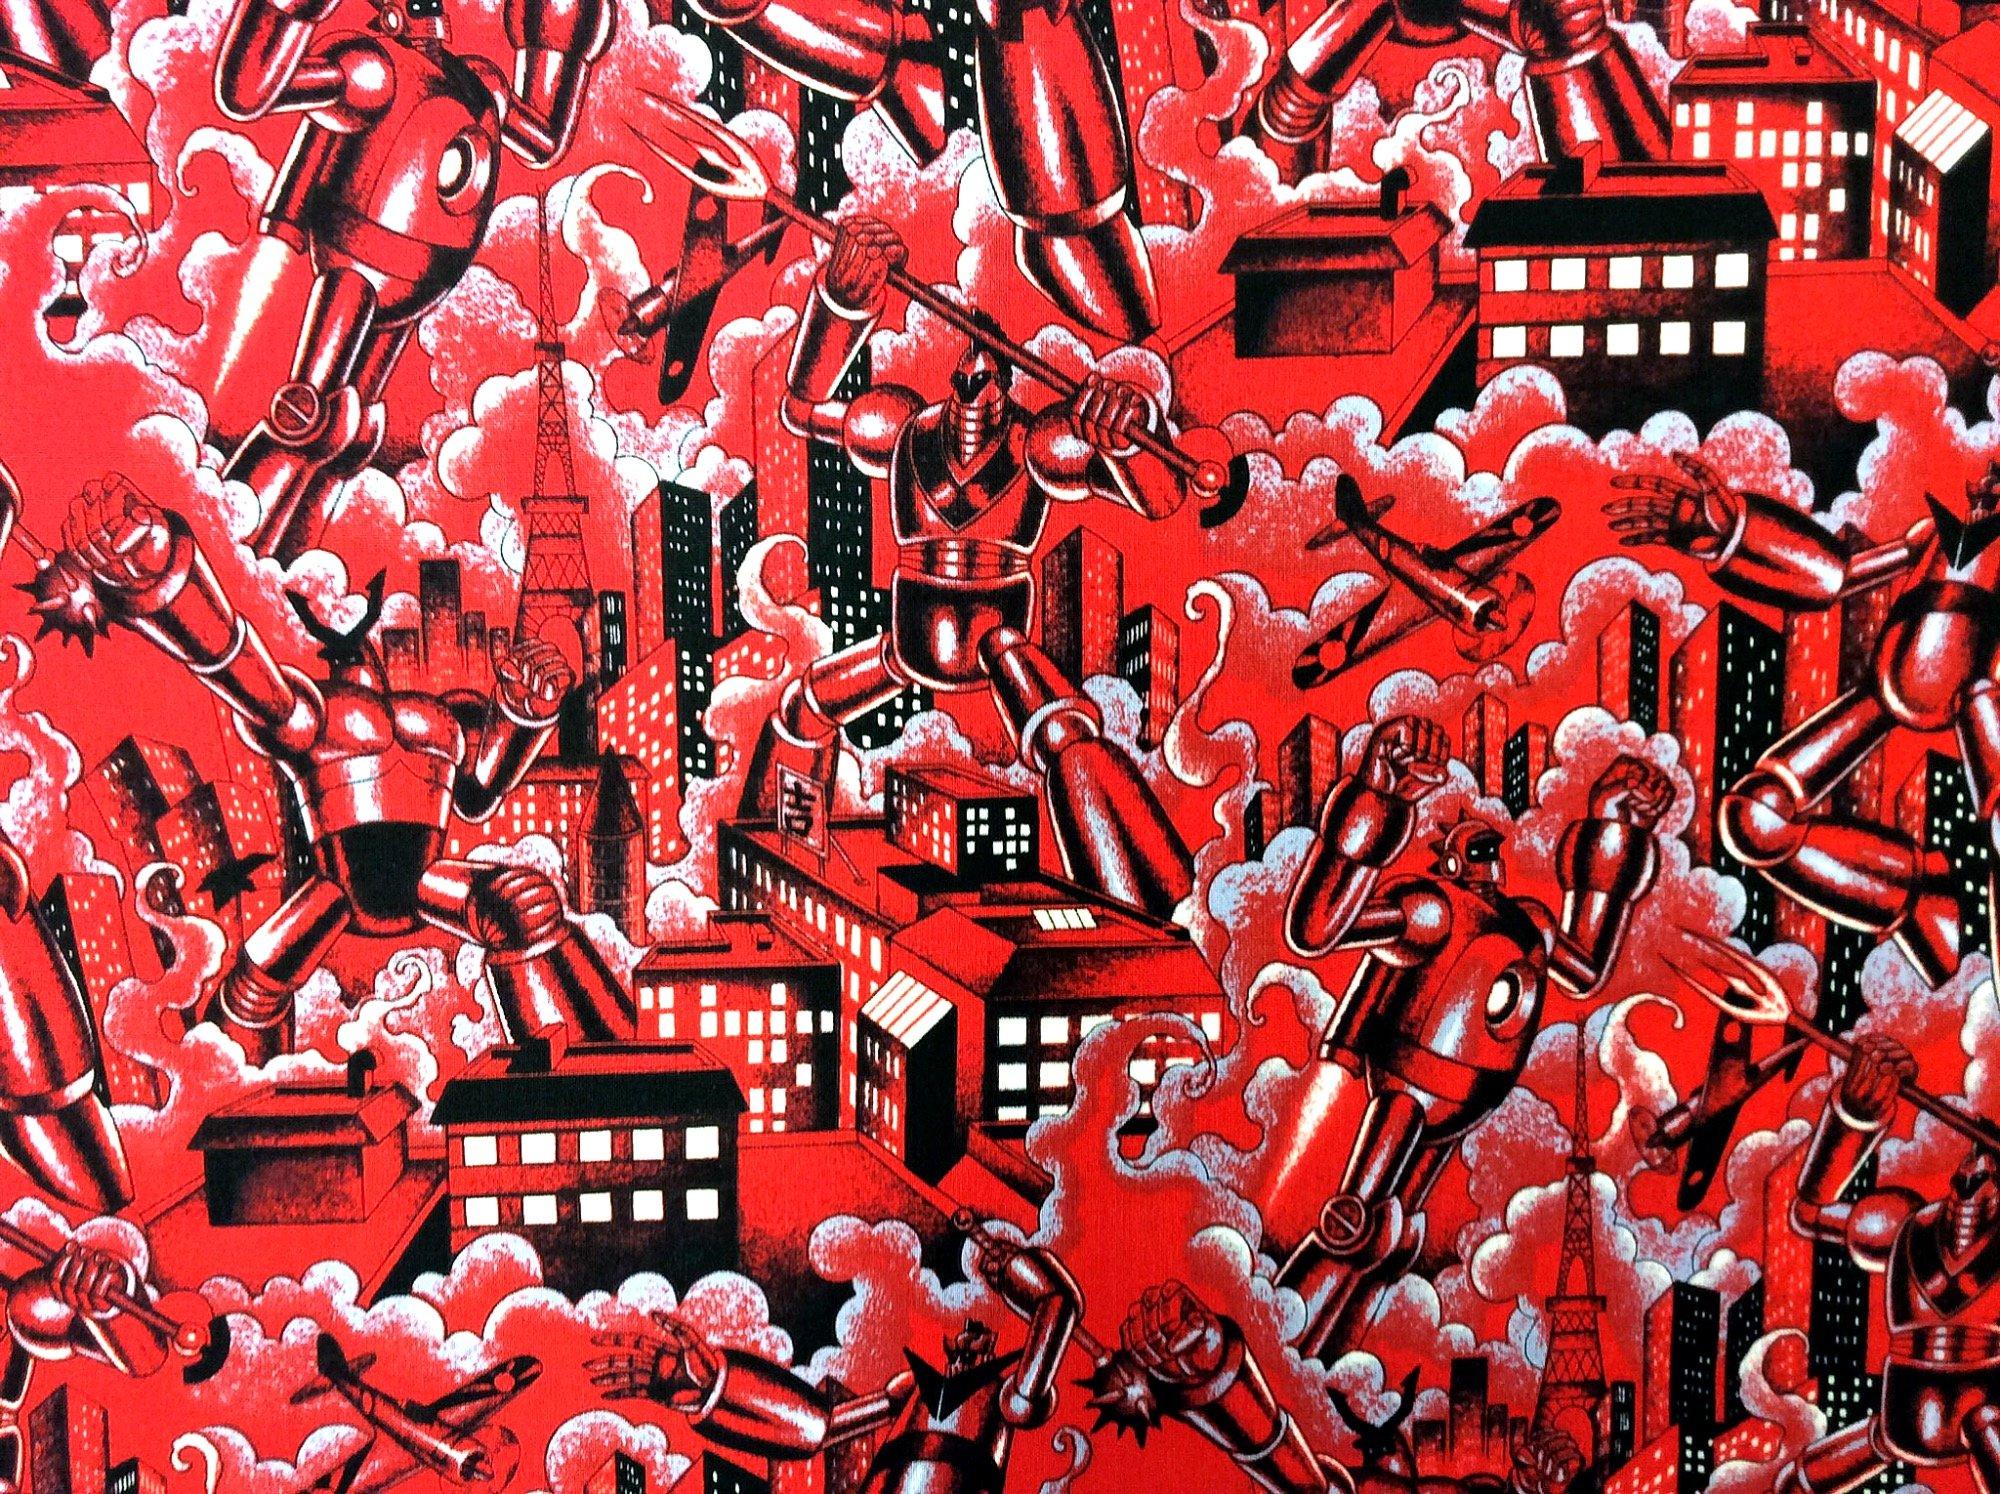 Japanese Asian Tin Toys Science Fiction Tokyo Robots Retro Cotton Quilt Fabric AH264